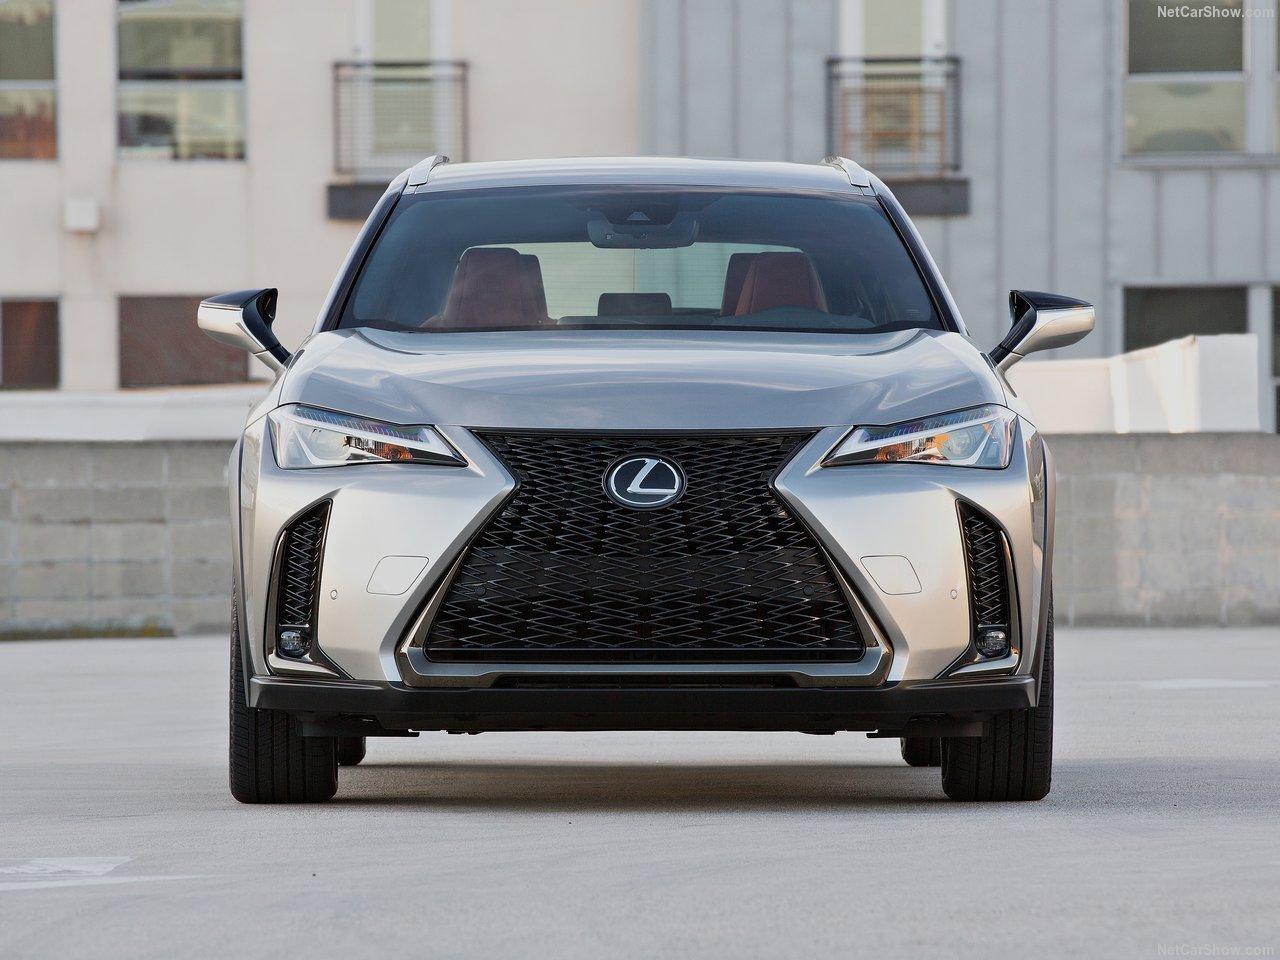 Lexus-UX-2019-1280-15_20181001185435469.jpg